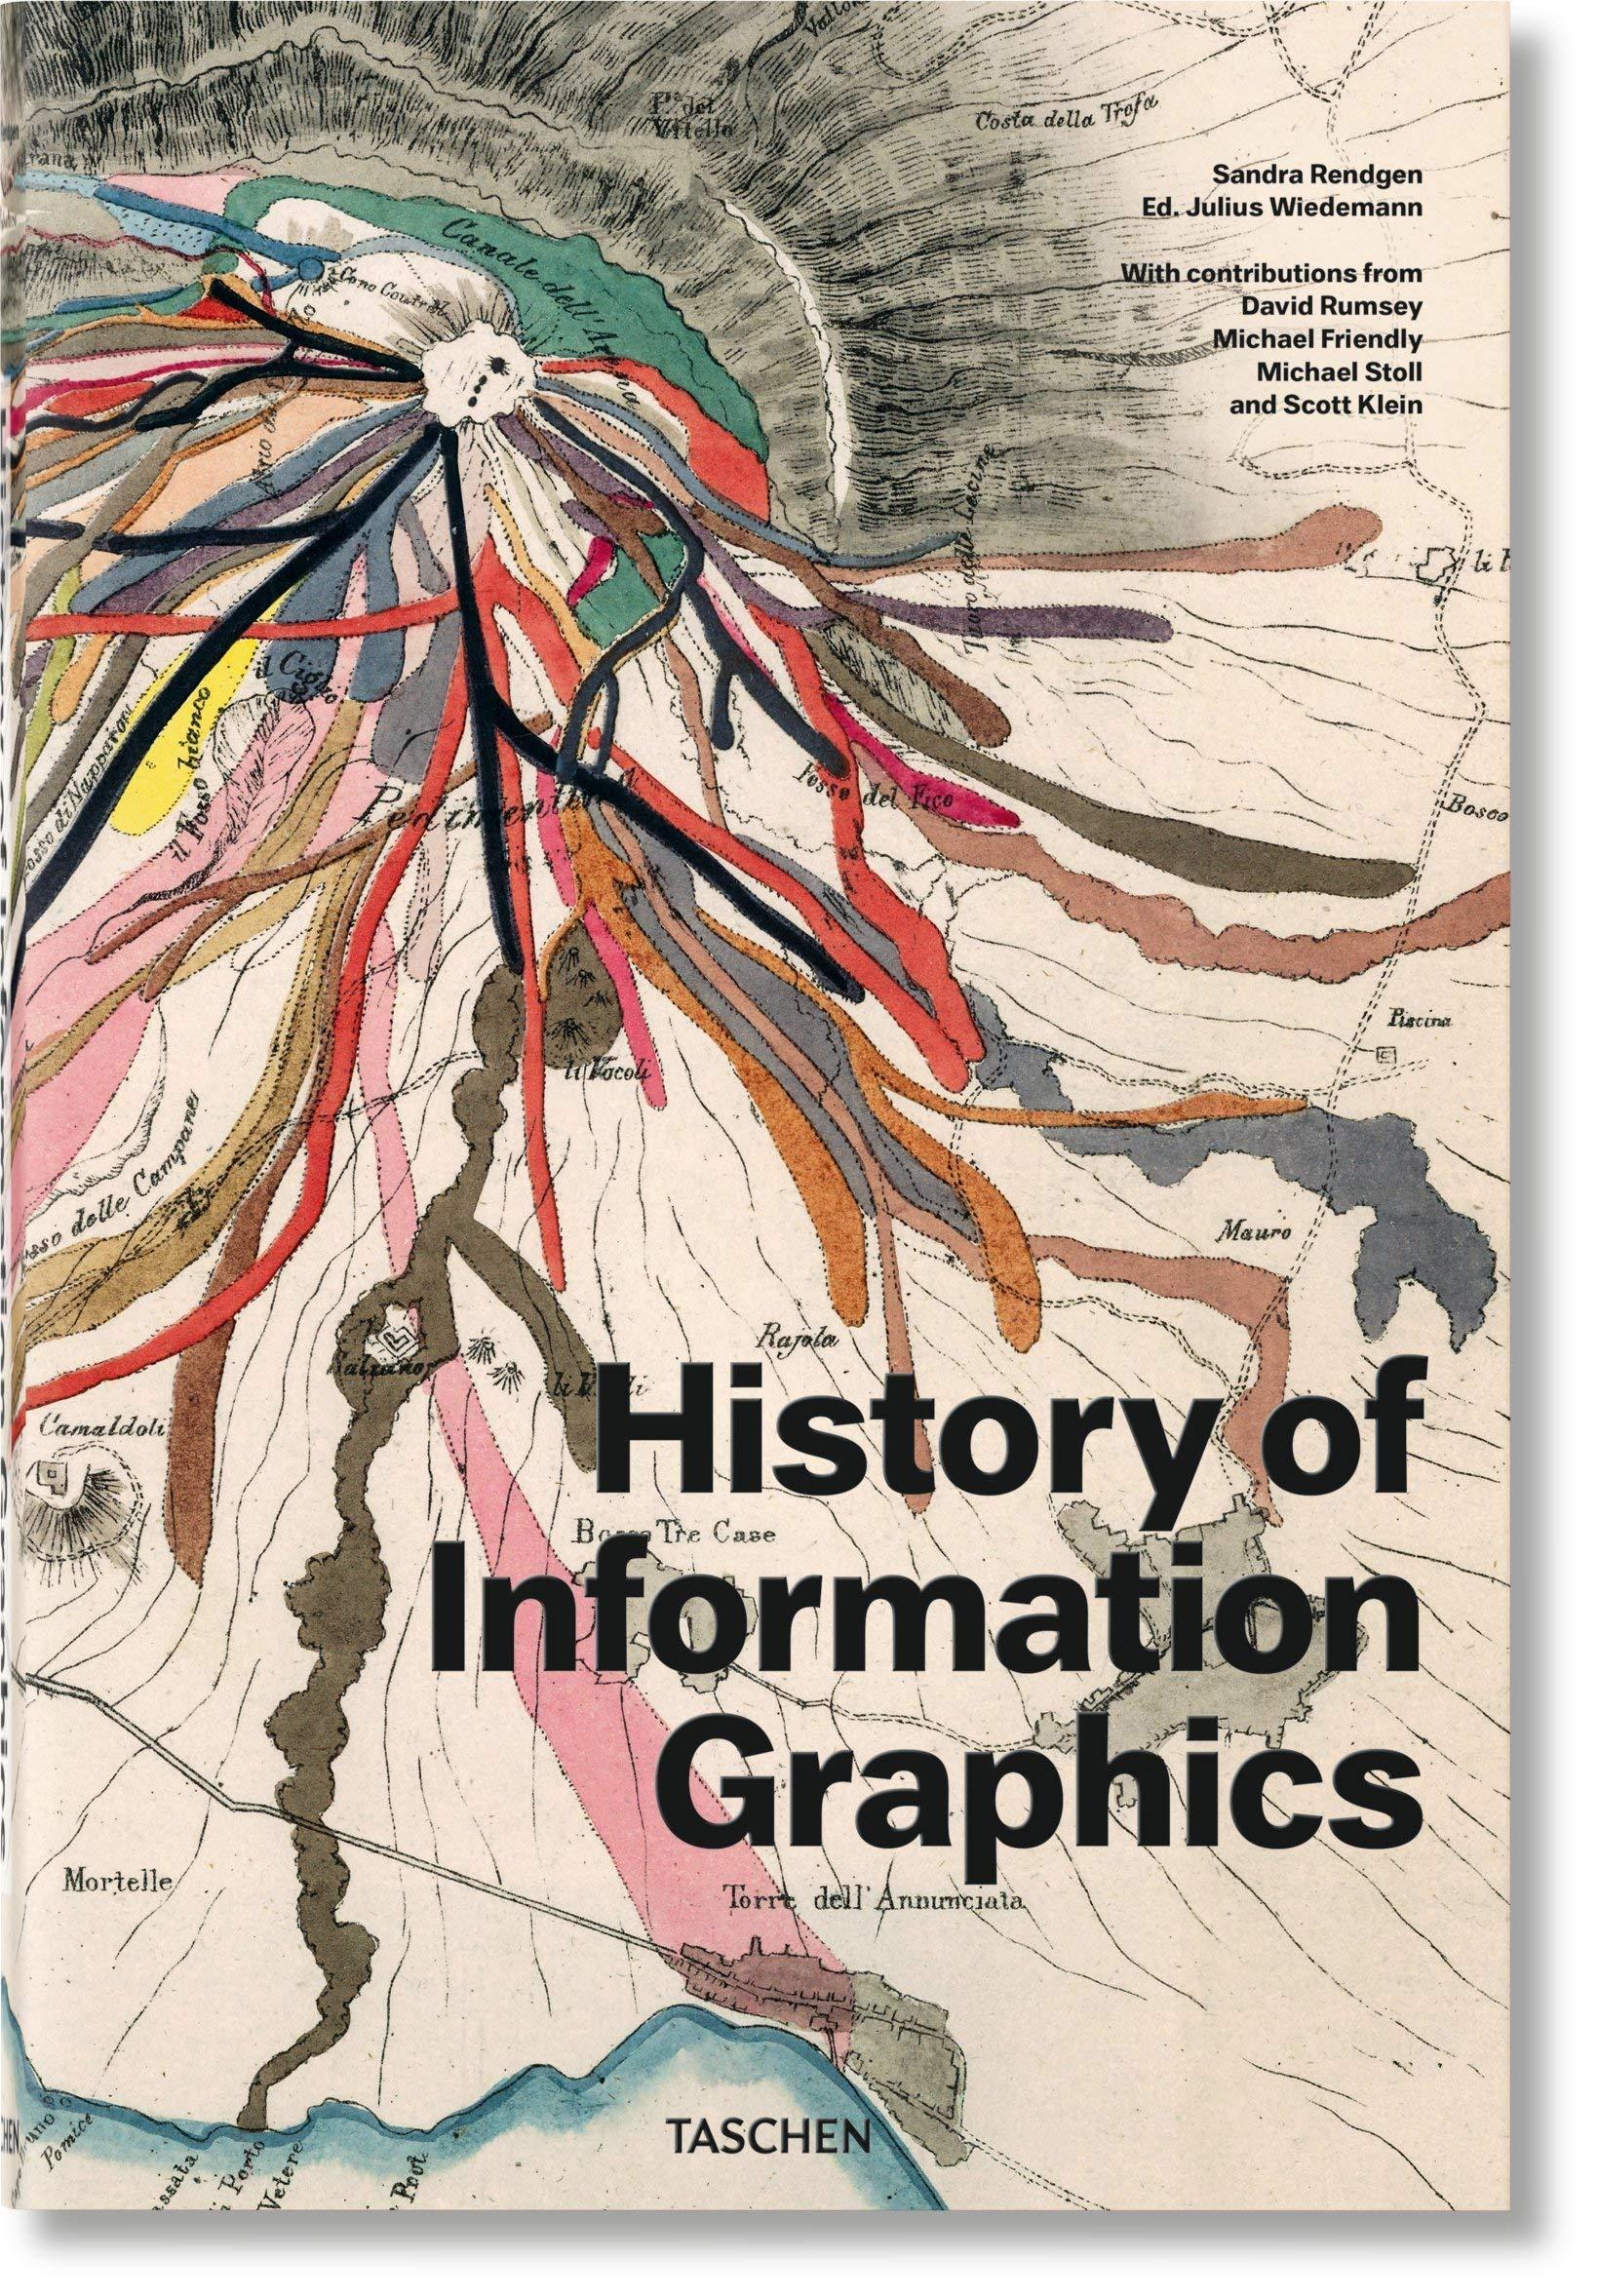 History of Information Graphics thumbnail